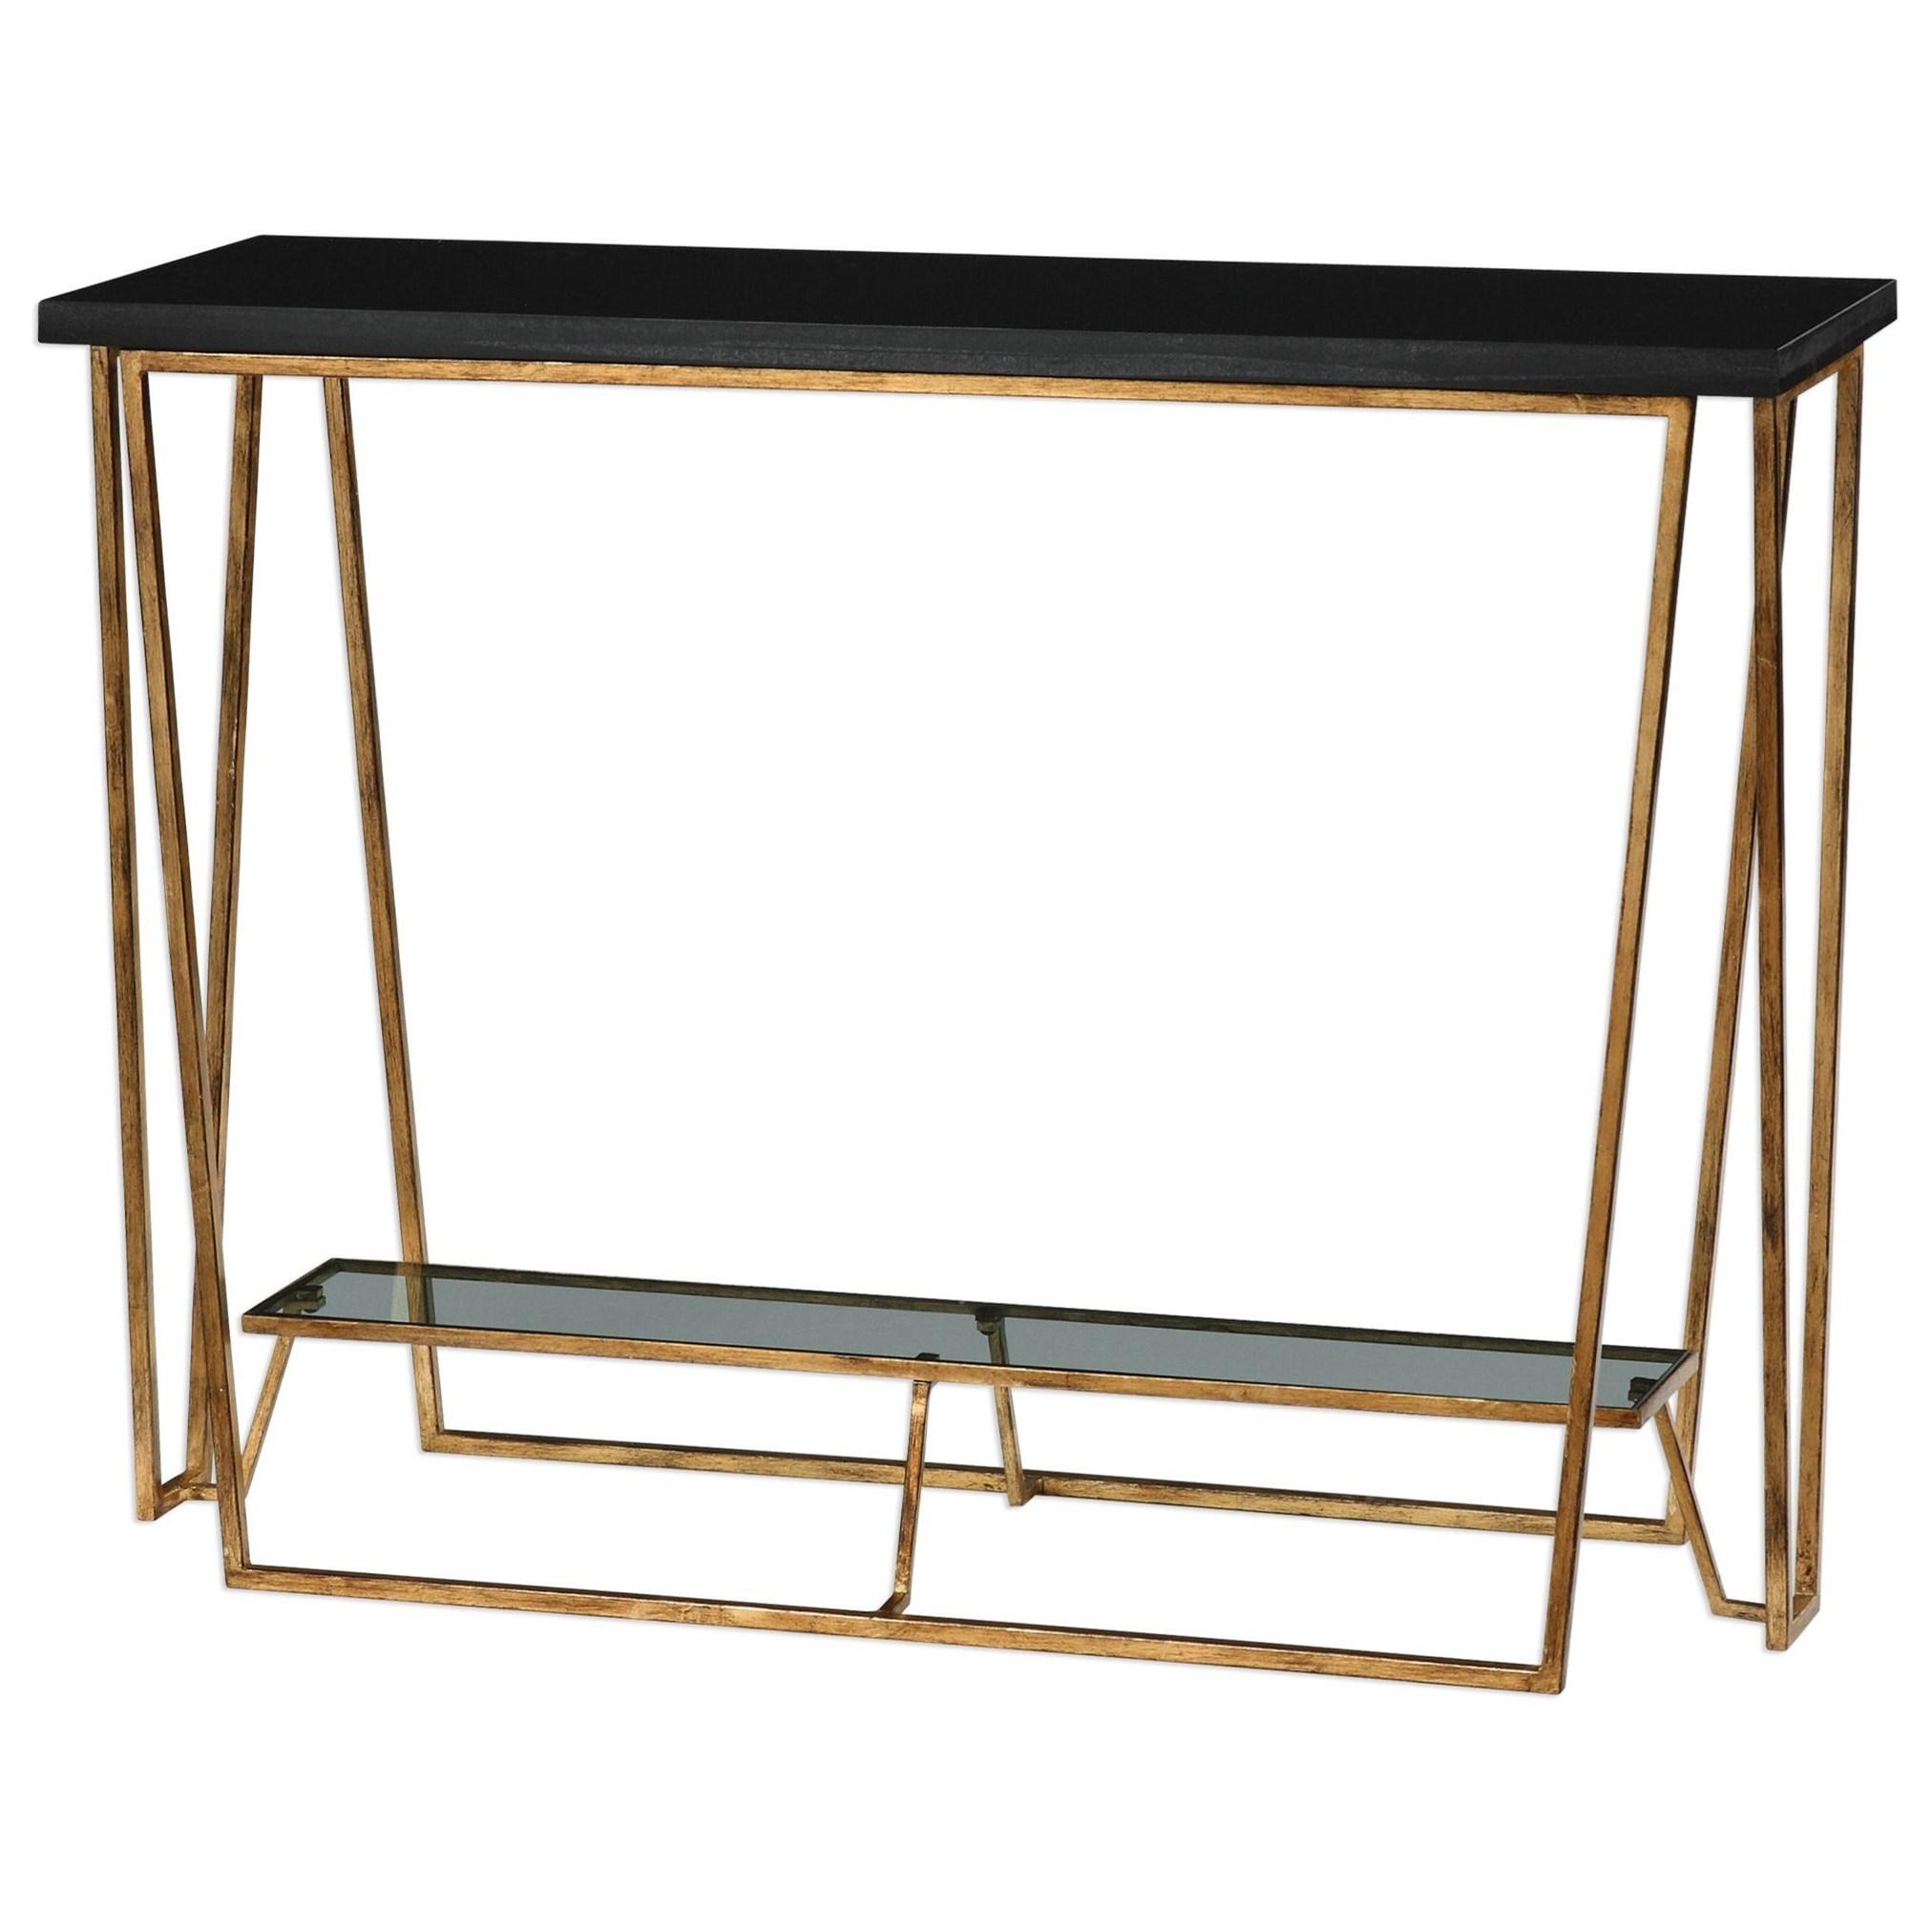 Marvelous Uttermost Accent FurnitureAgnes Black Granite Console Table ...